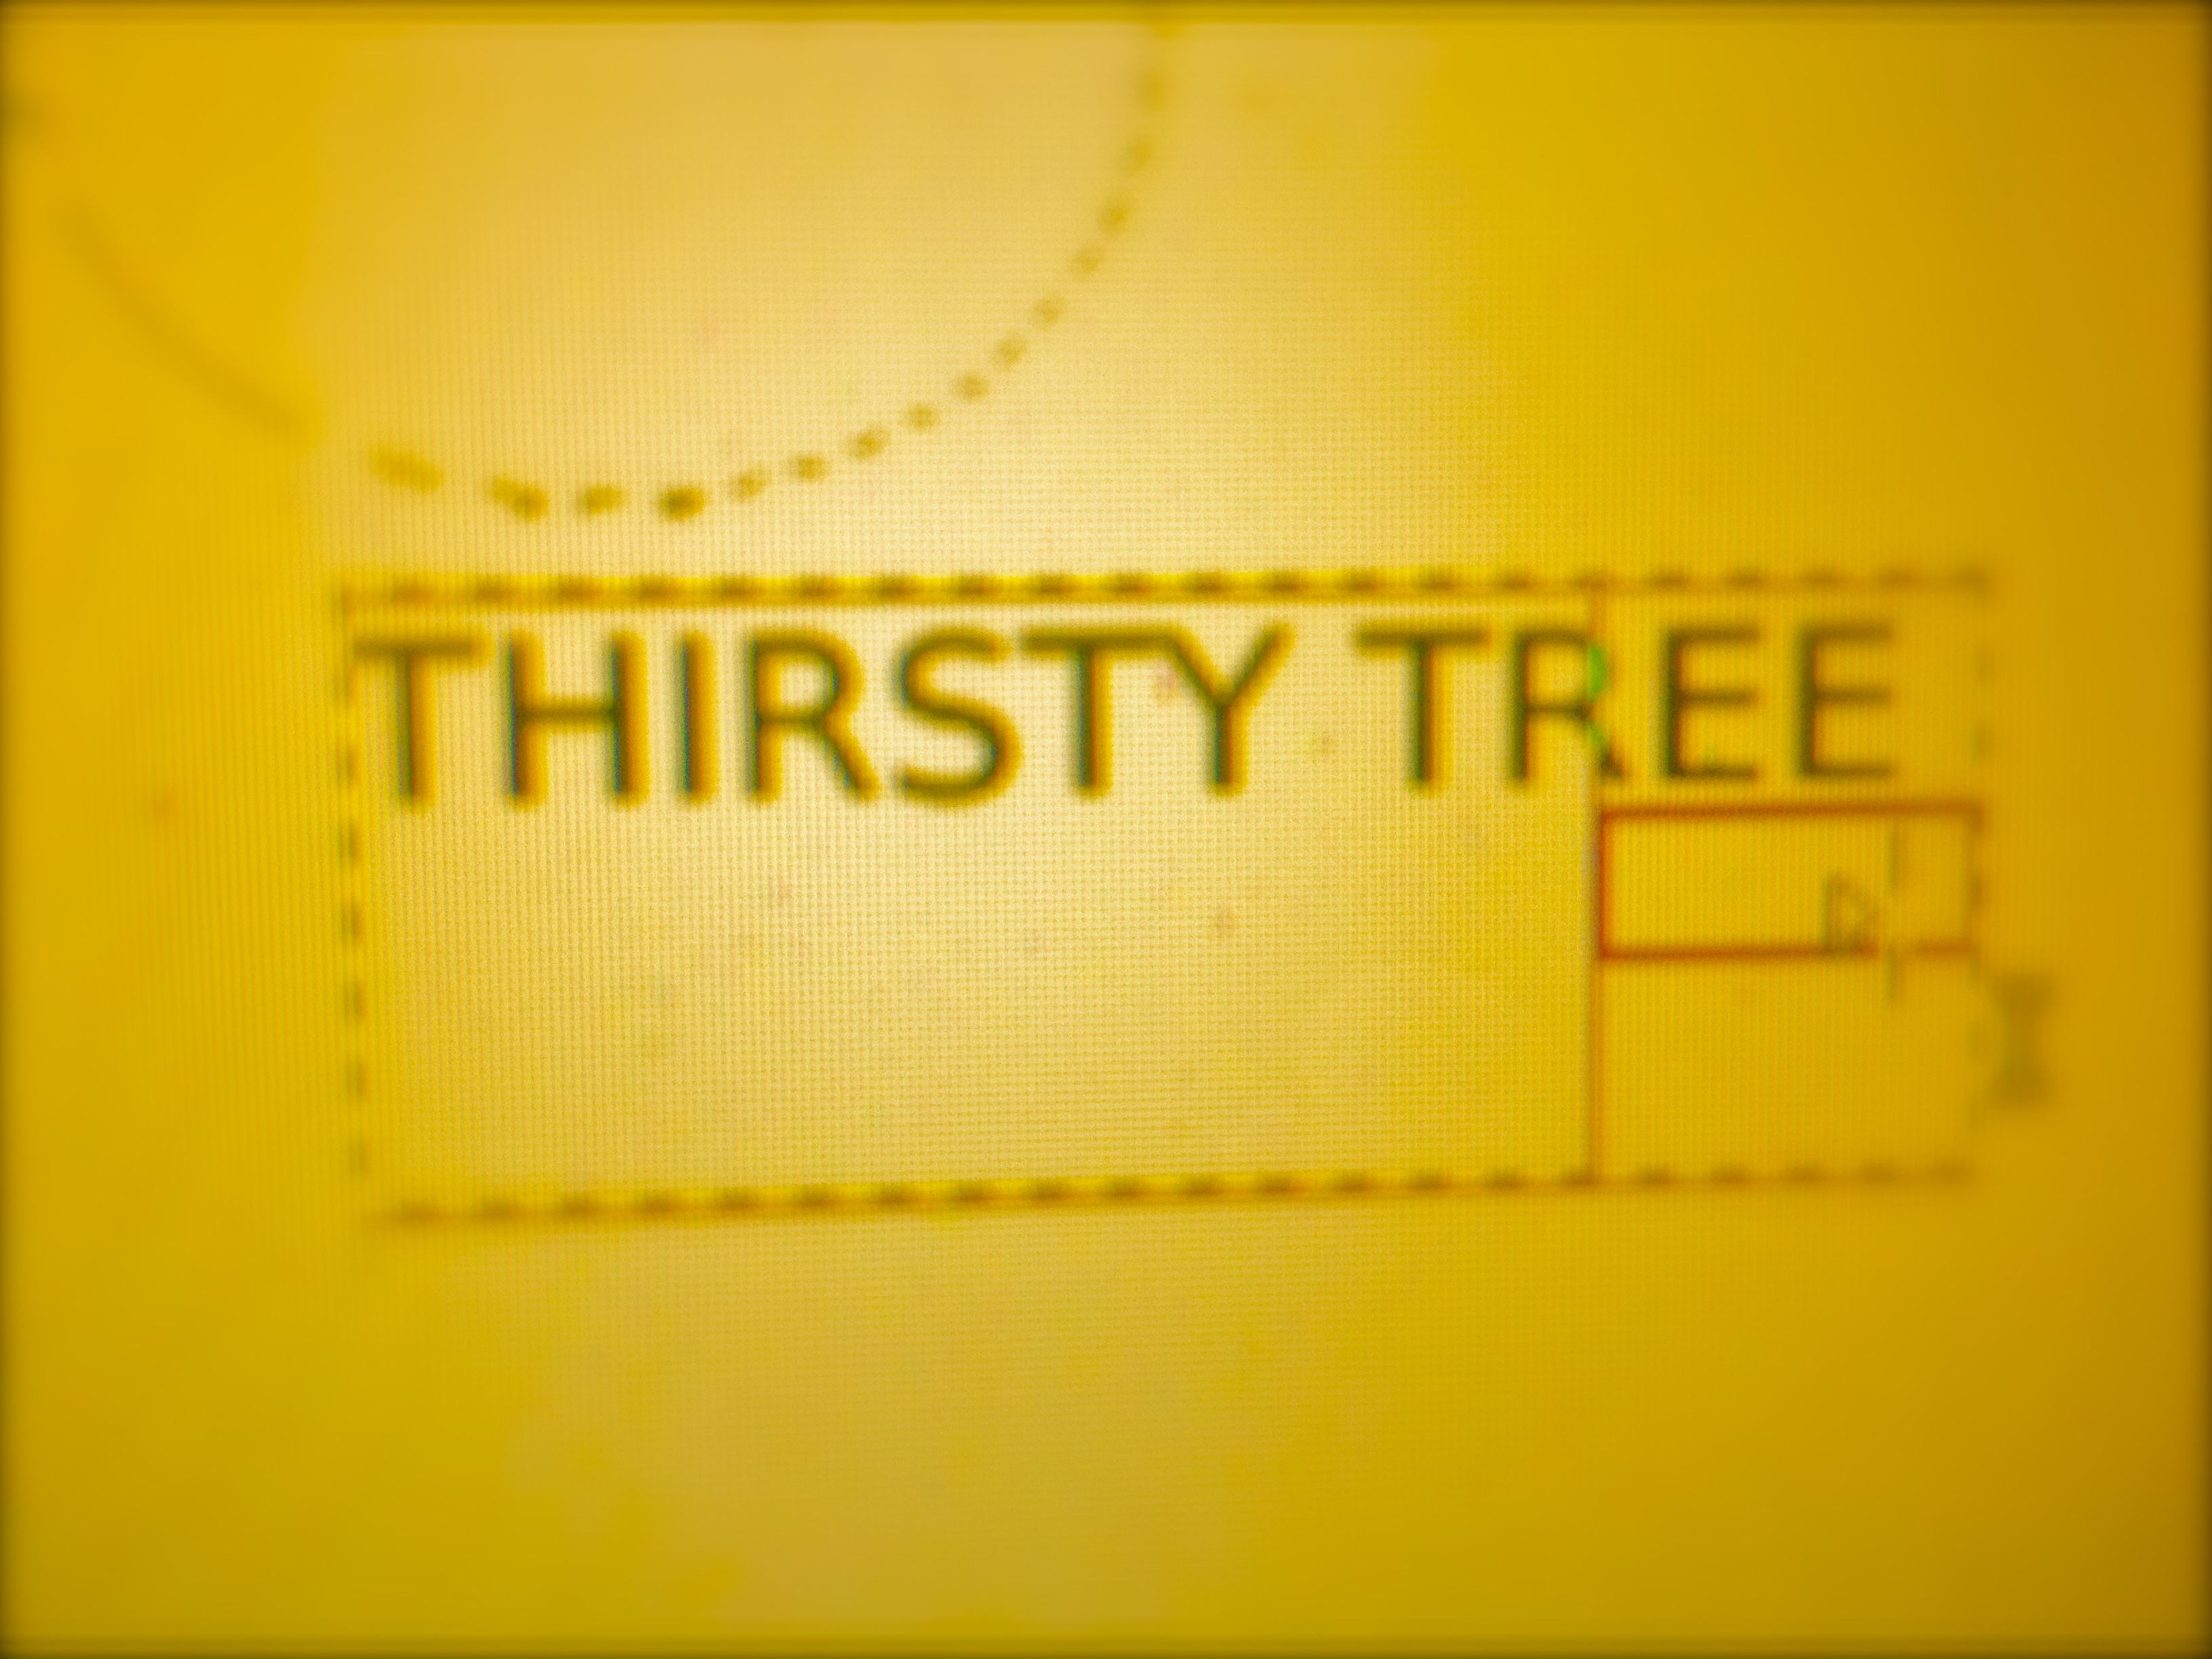 THIRSTY TREE JPEG13